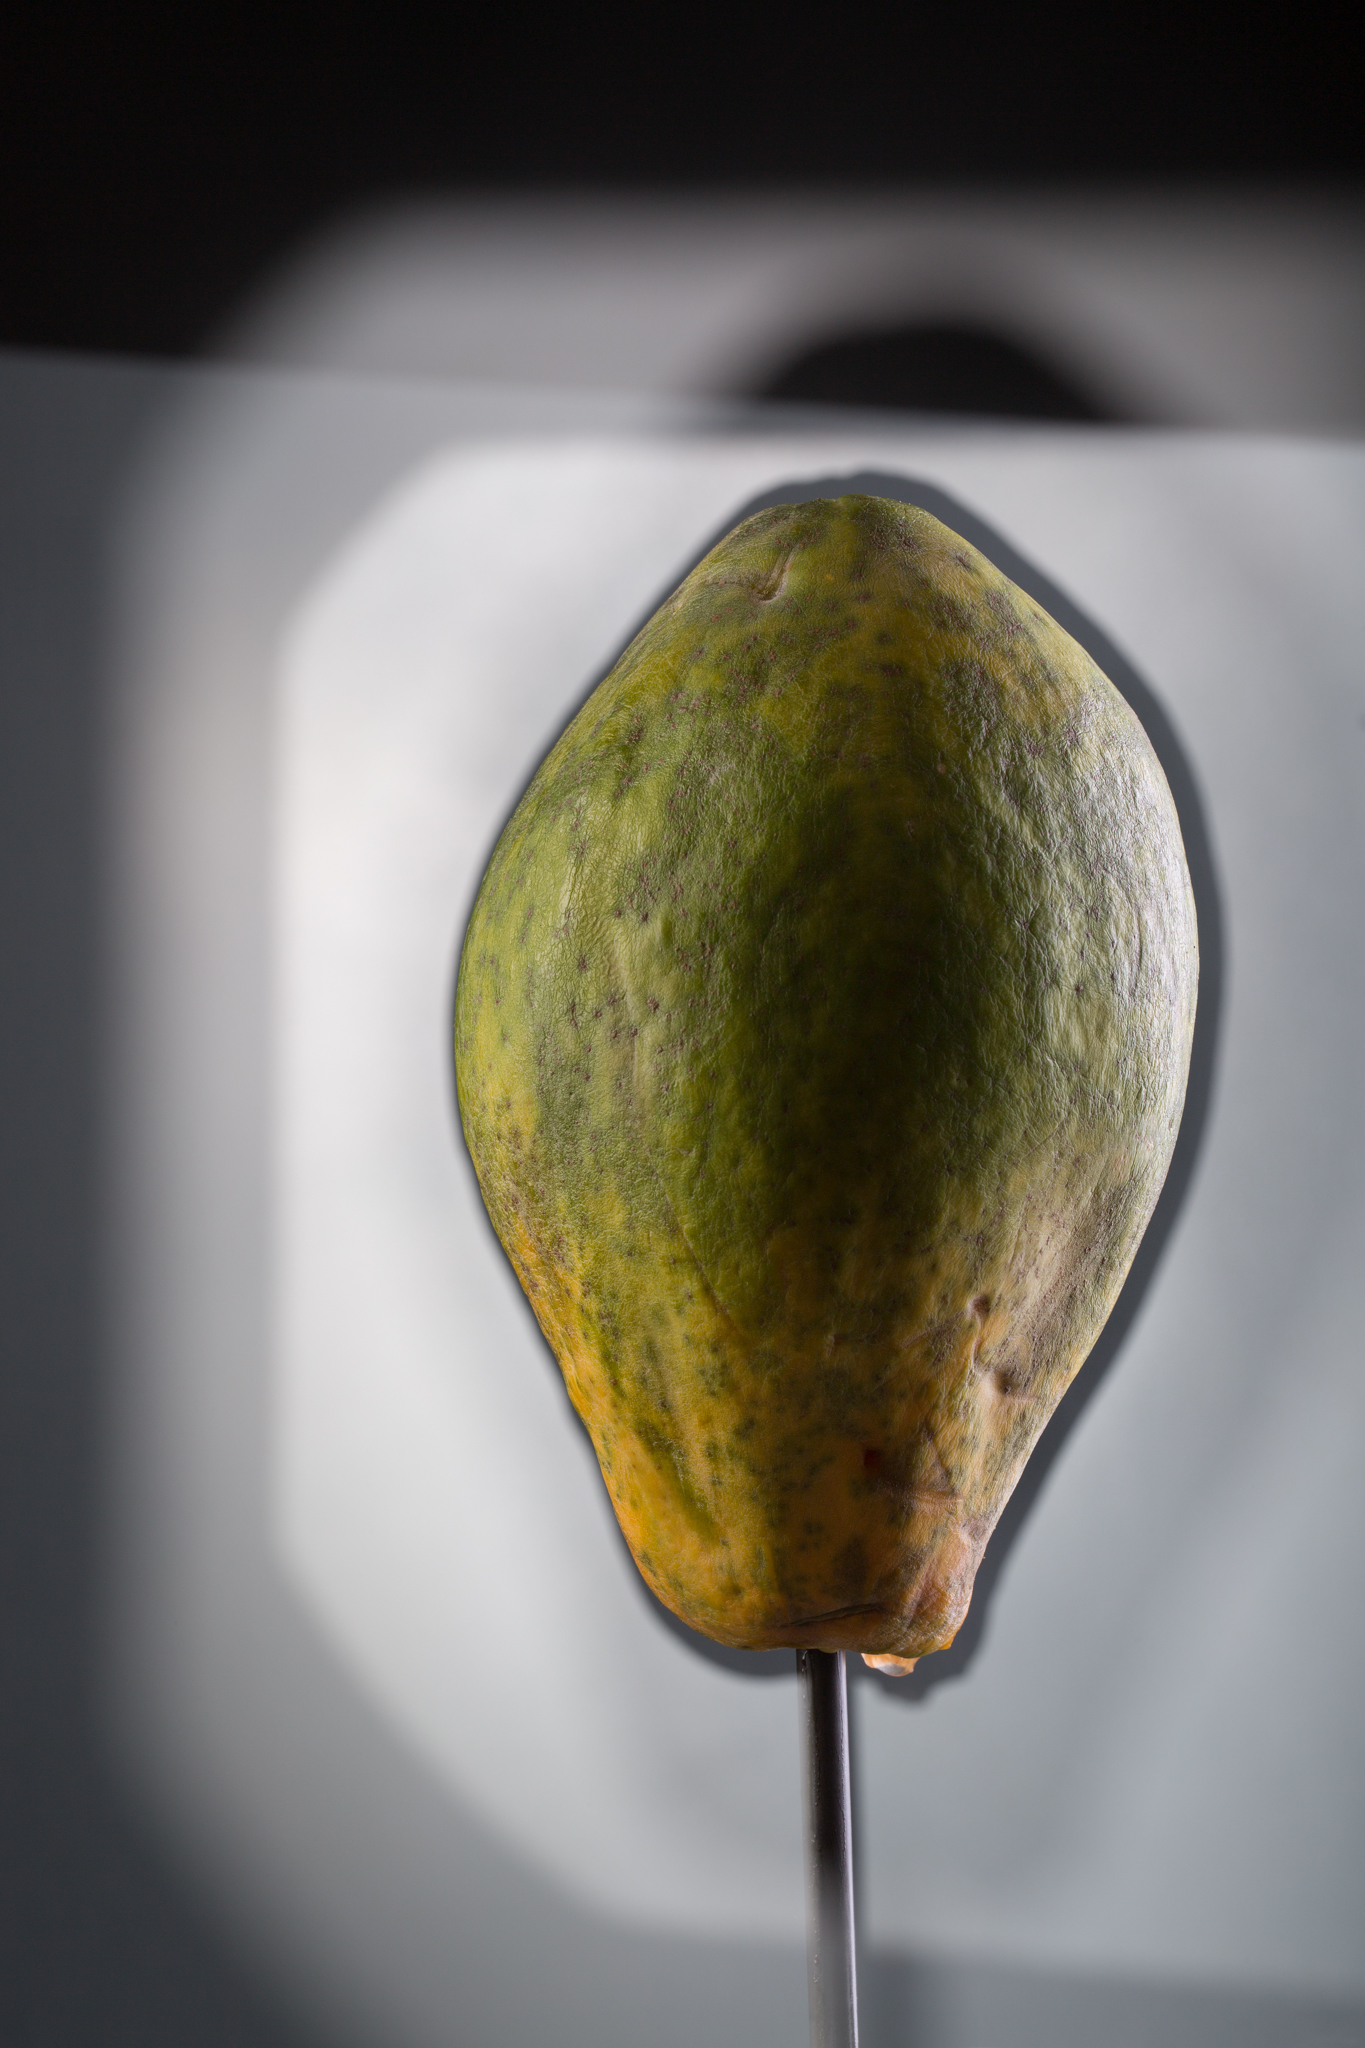 2019_06_05 papaya 002 final 2048.jpg